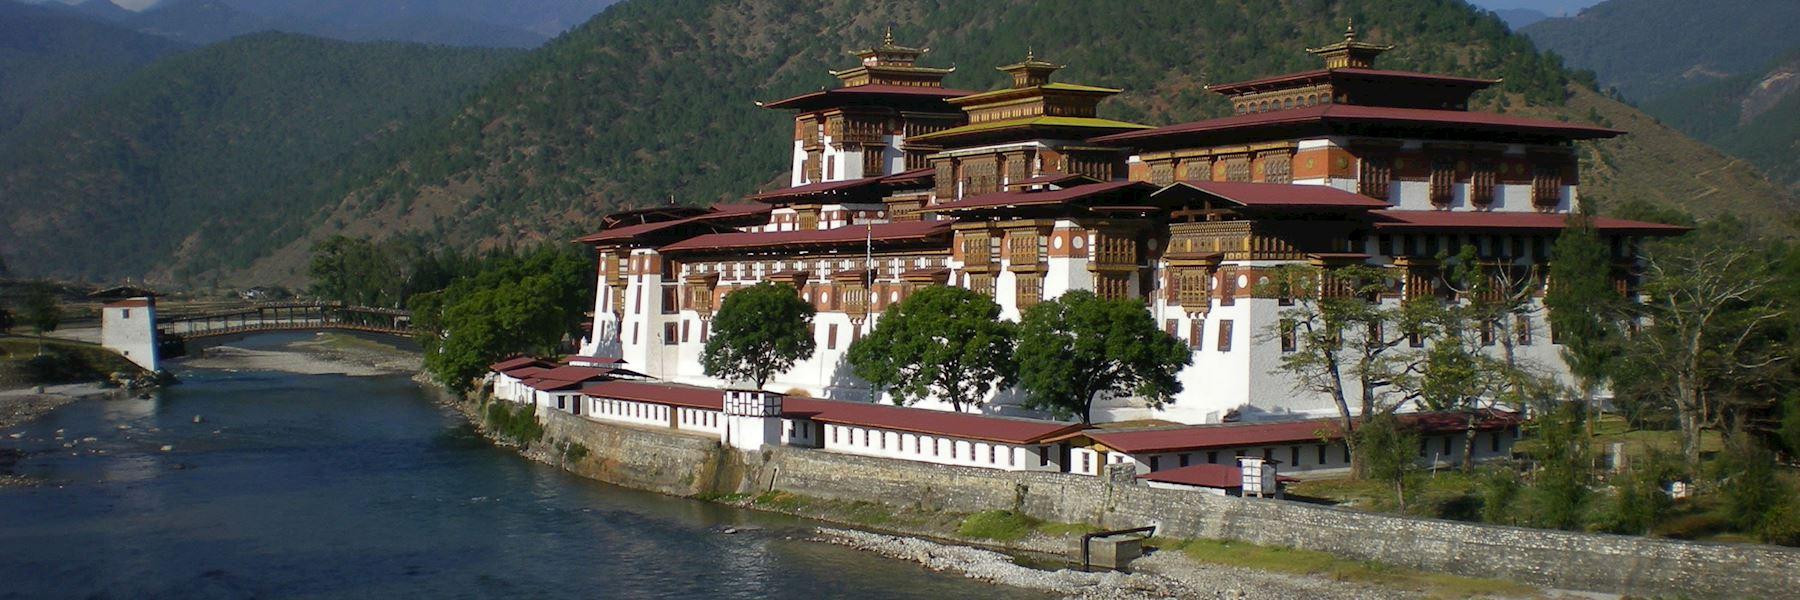 Visions of Bhutan